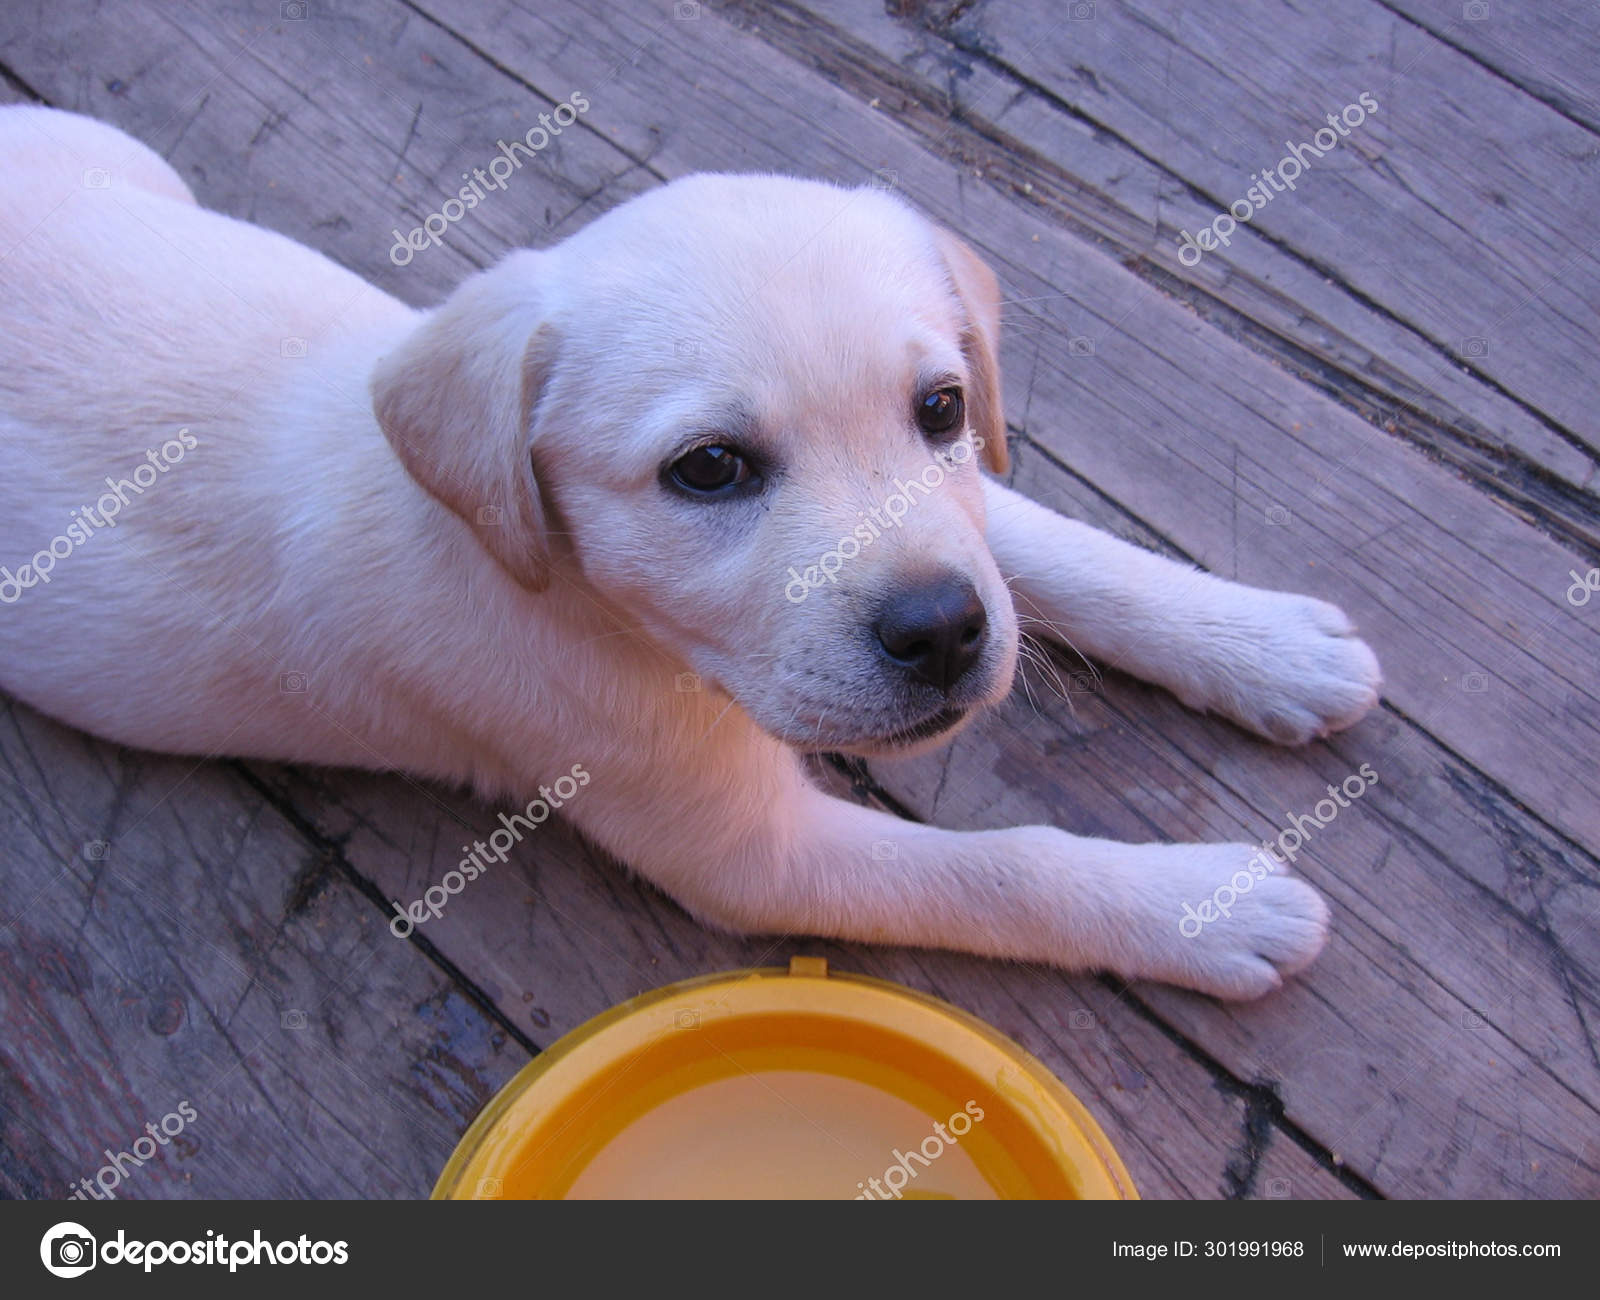 Cute Little White Puppy Labrador Lying Beside An Empty Bowl Stock Photo C Alyamosurova 301991968